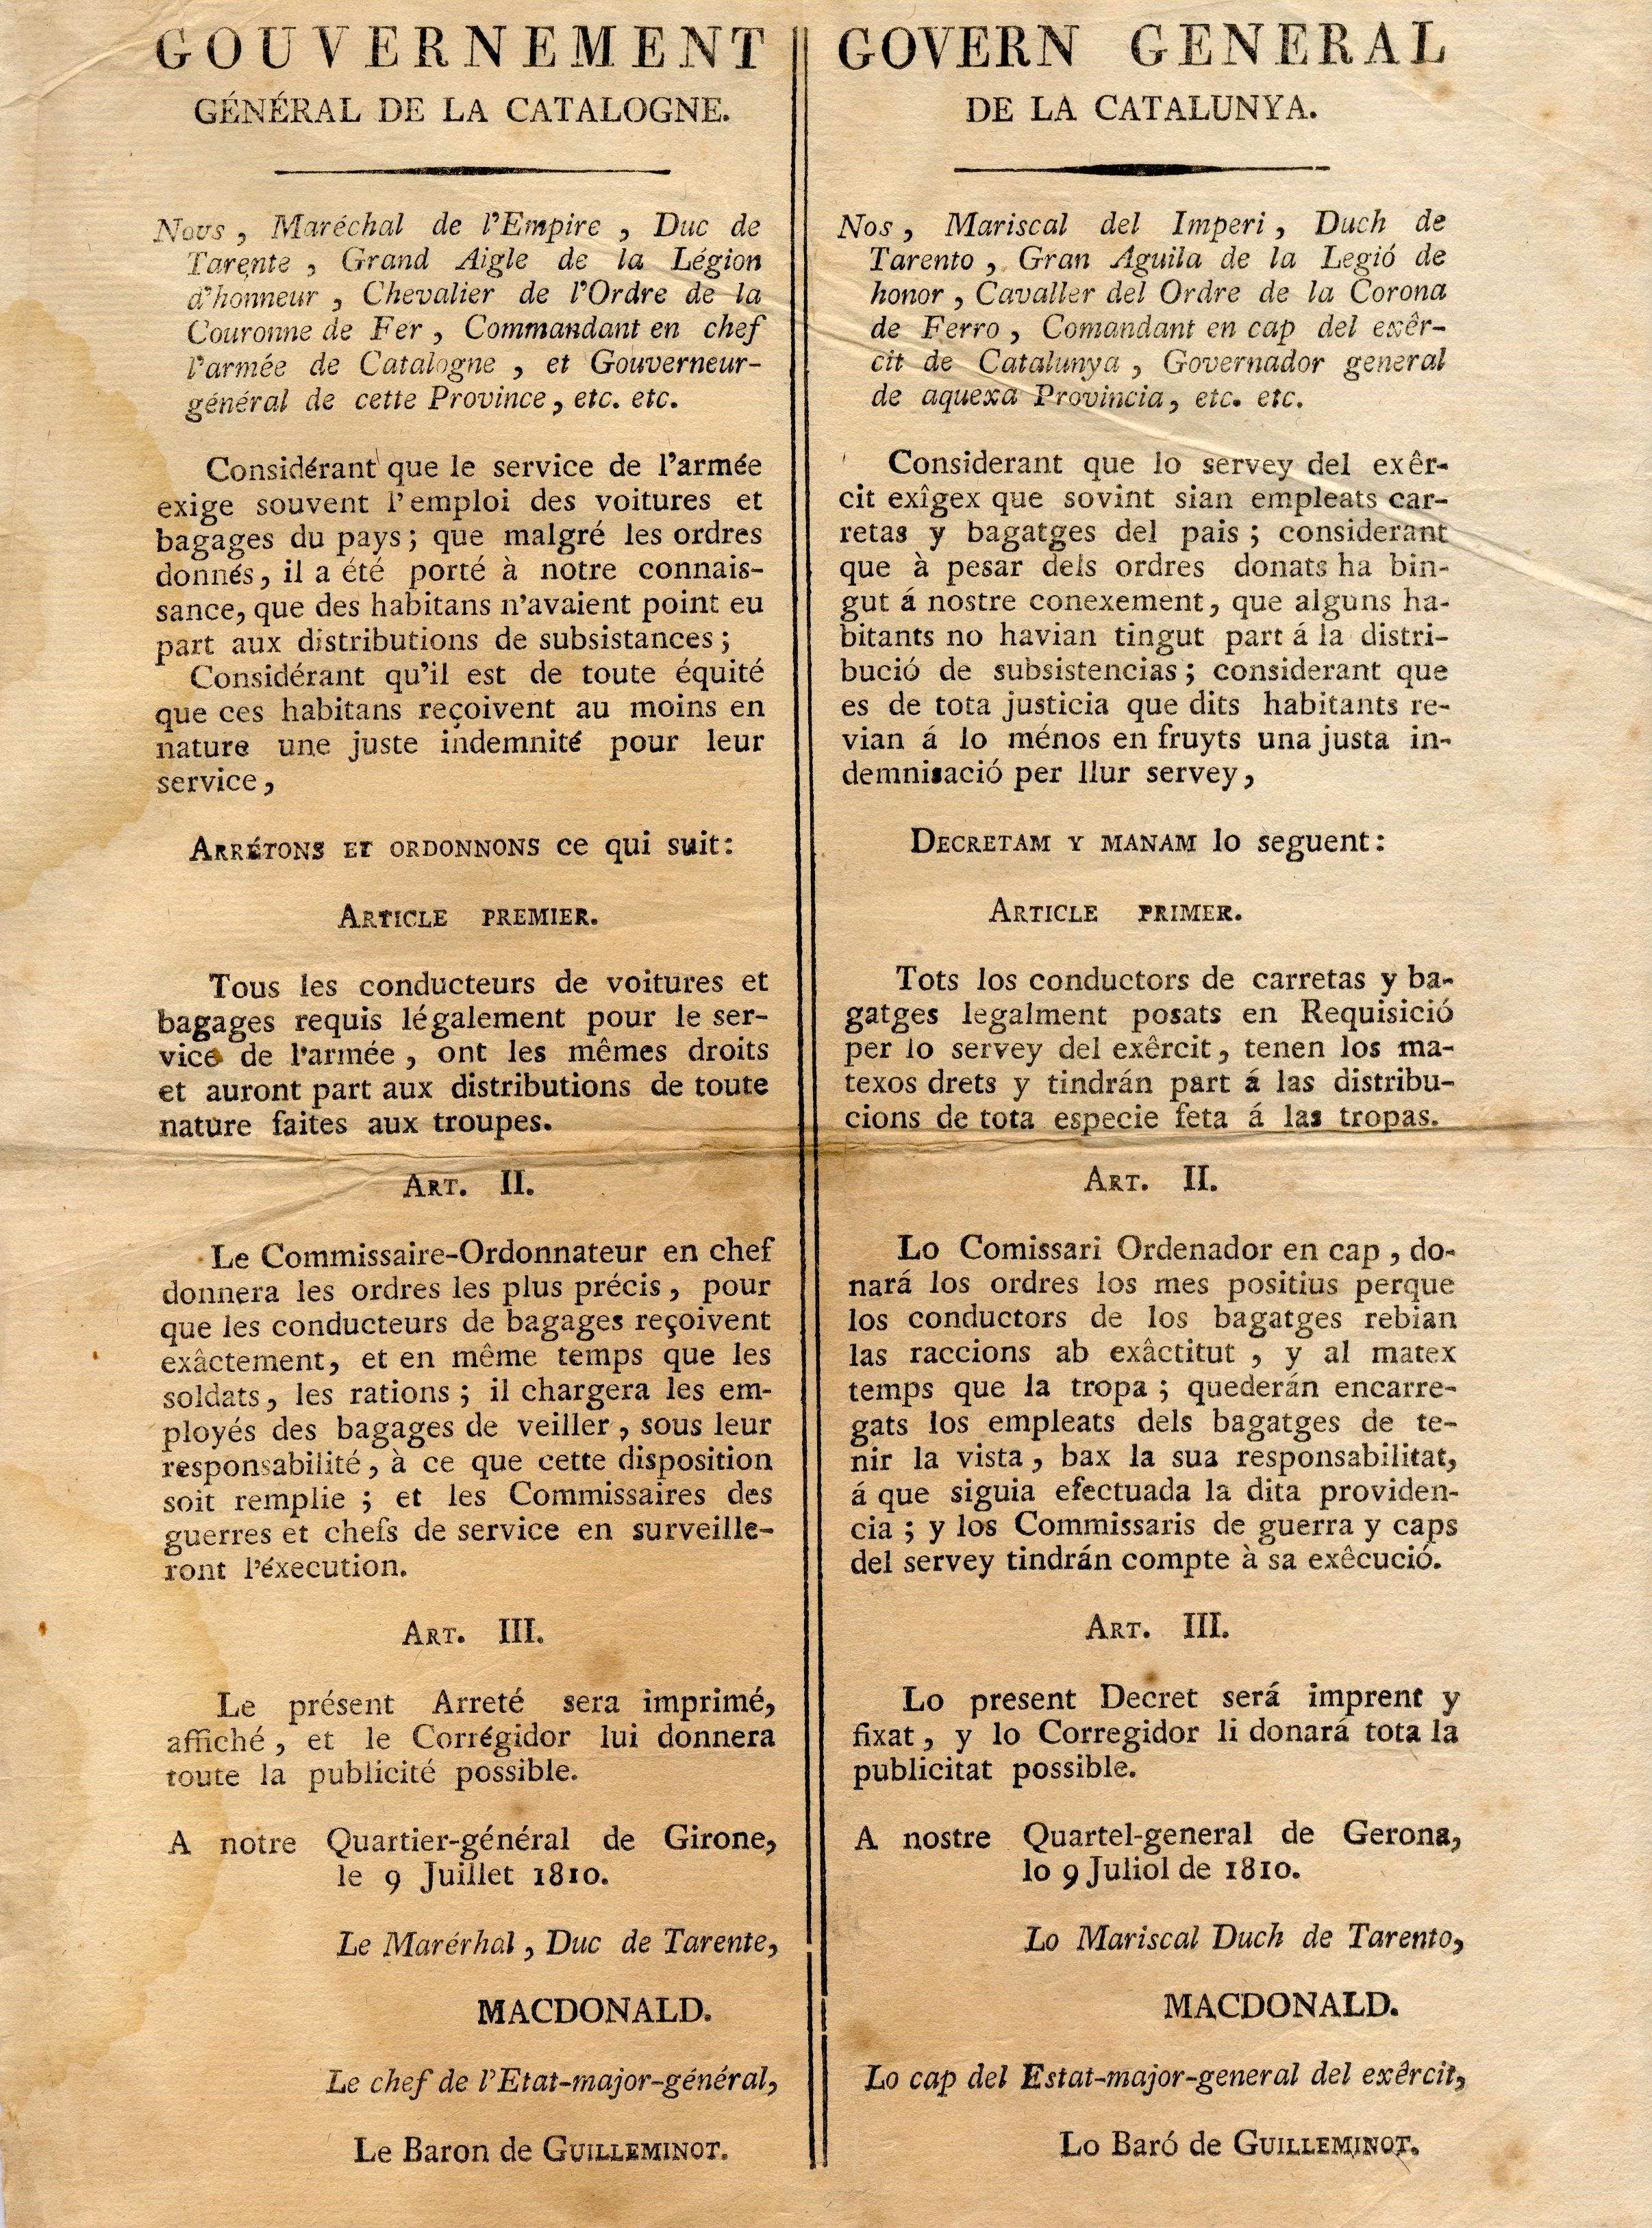 AMHL 101-U-U300-U310-1810_s/n_ban francès-català